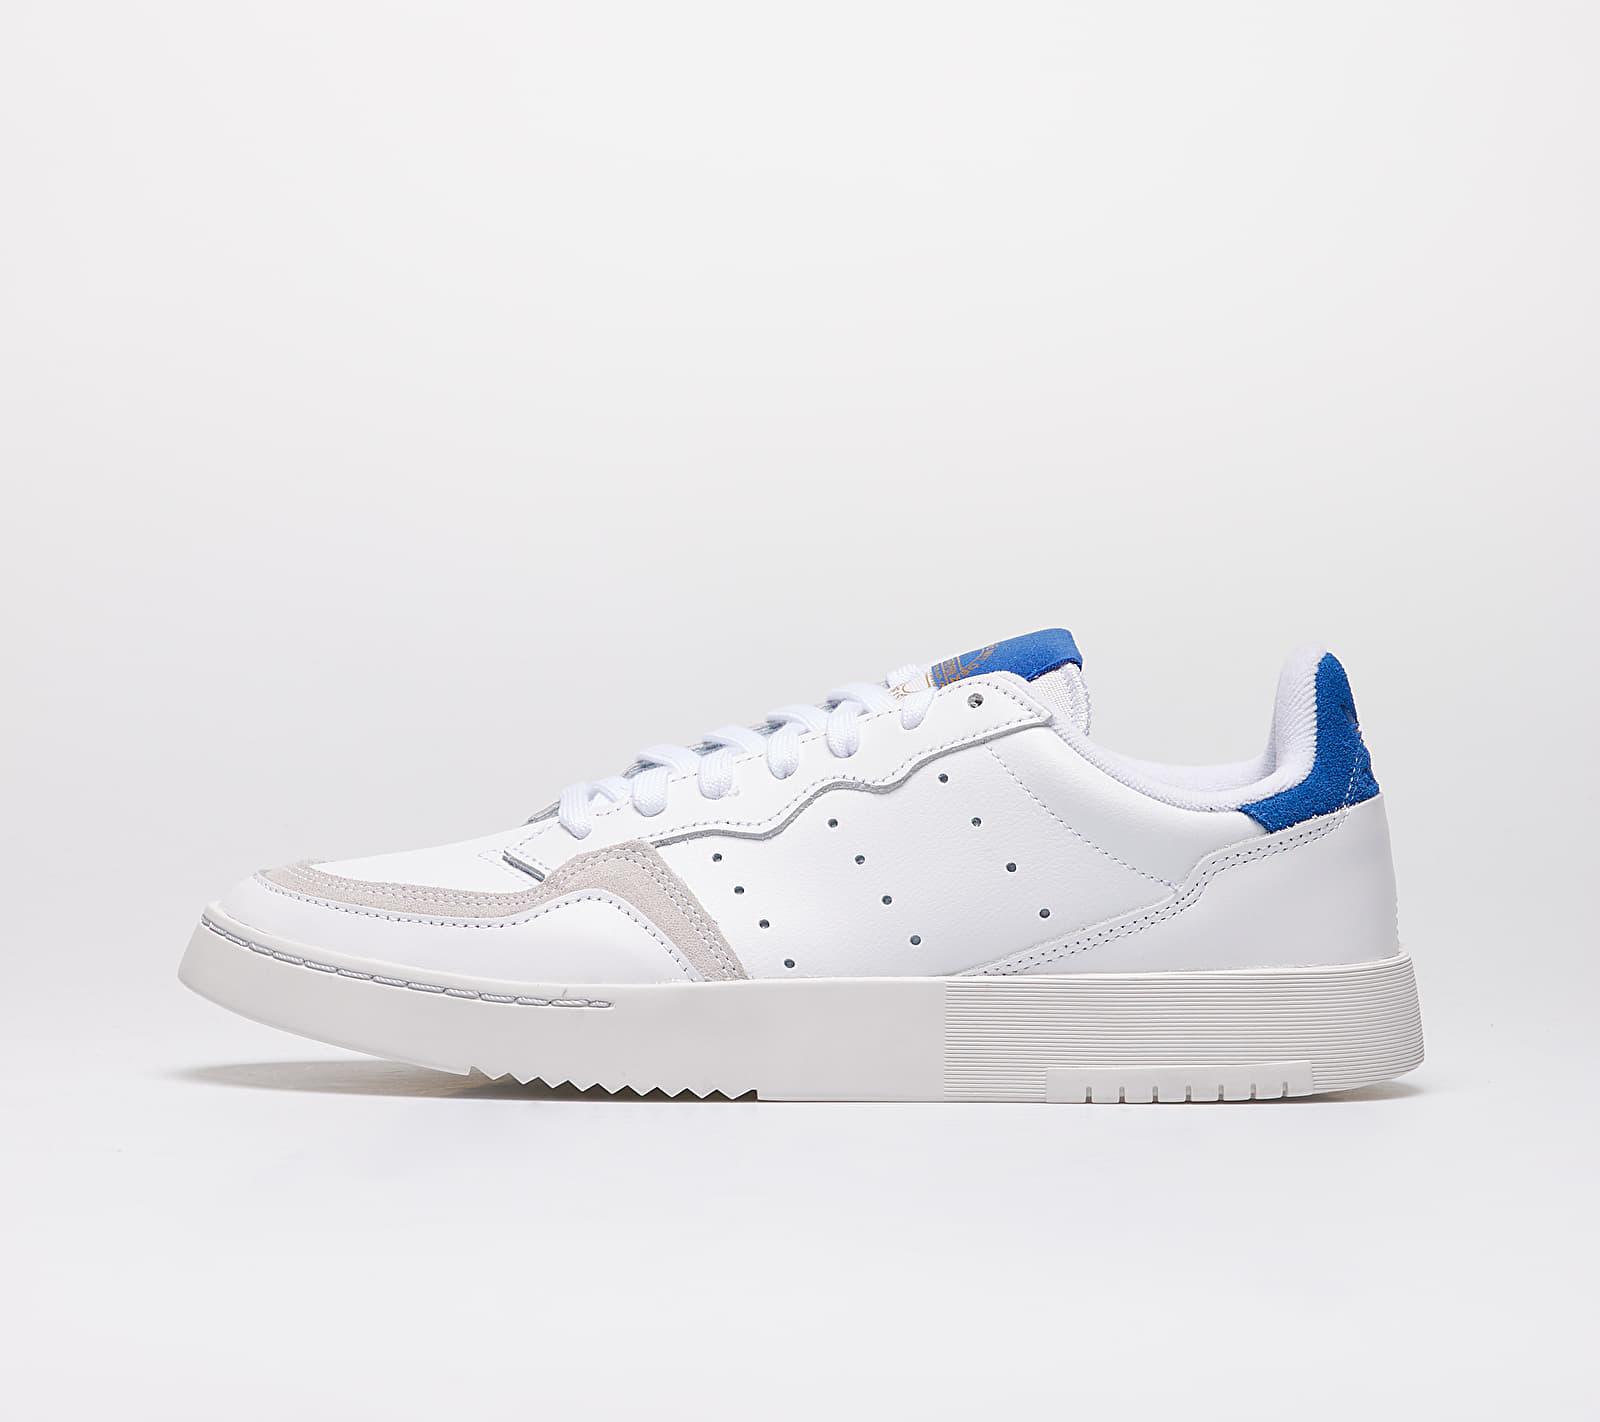 adidas Supercourt Ftw White/ Ftw White/ Royal Blue EUR 41 1/3